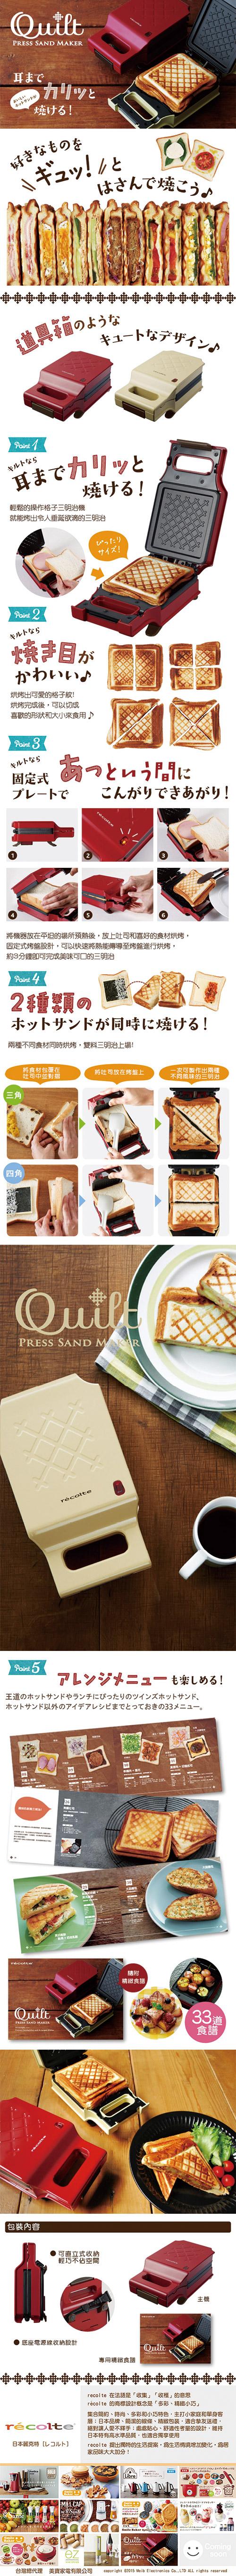 日本 recolte Press Sand Maker Quilt 格子三明治機 甜心紅